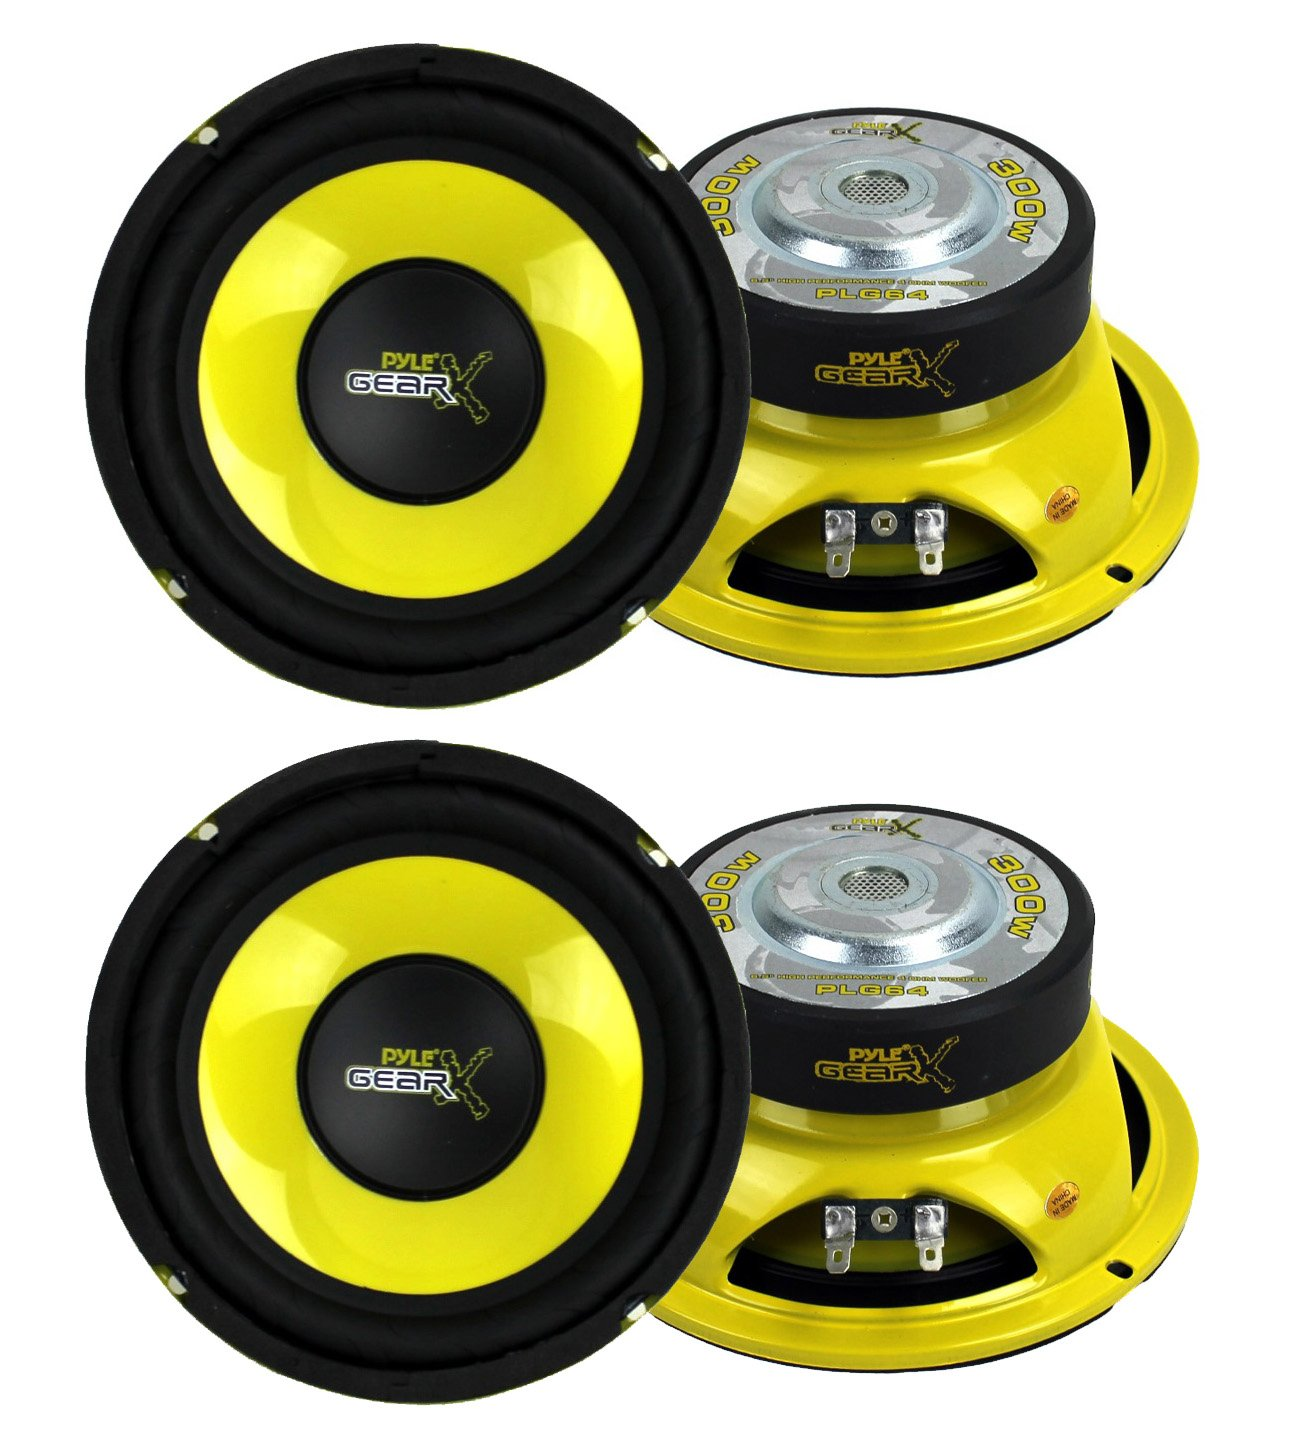 4) Pyle PLG64 6.5'' 1200 Watt Car Mid Bass/Midrange Subwoofers Sub Power Speakers